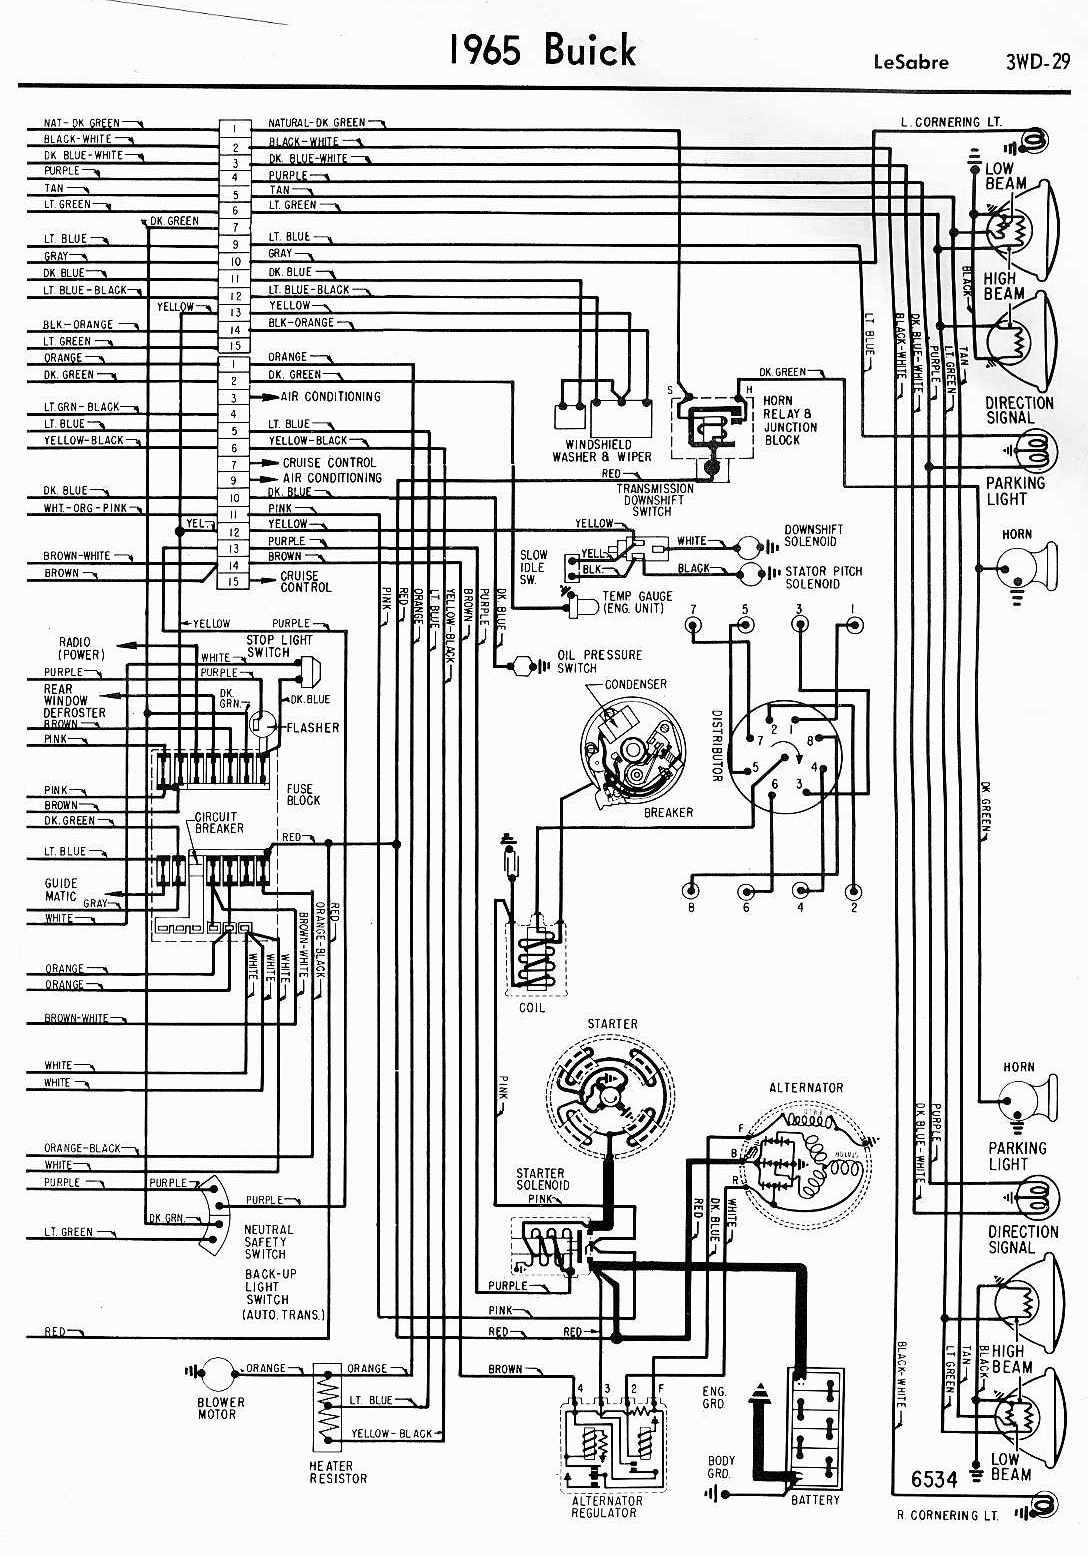 79 Jeep Cj7 Fuel Gauge Wiring Diagram Jeep Cj7 Gauge Restoration – Jeep Fuel Gauge Wiring Diagram For 1972